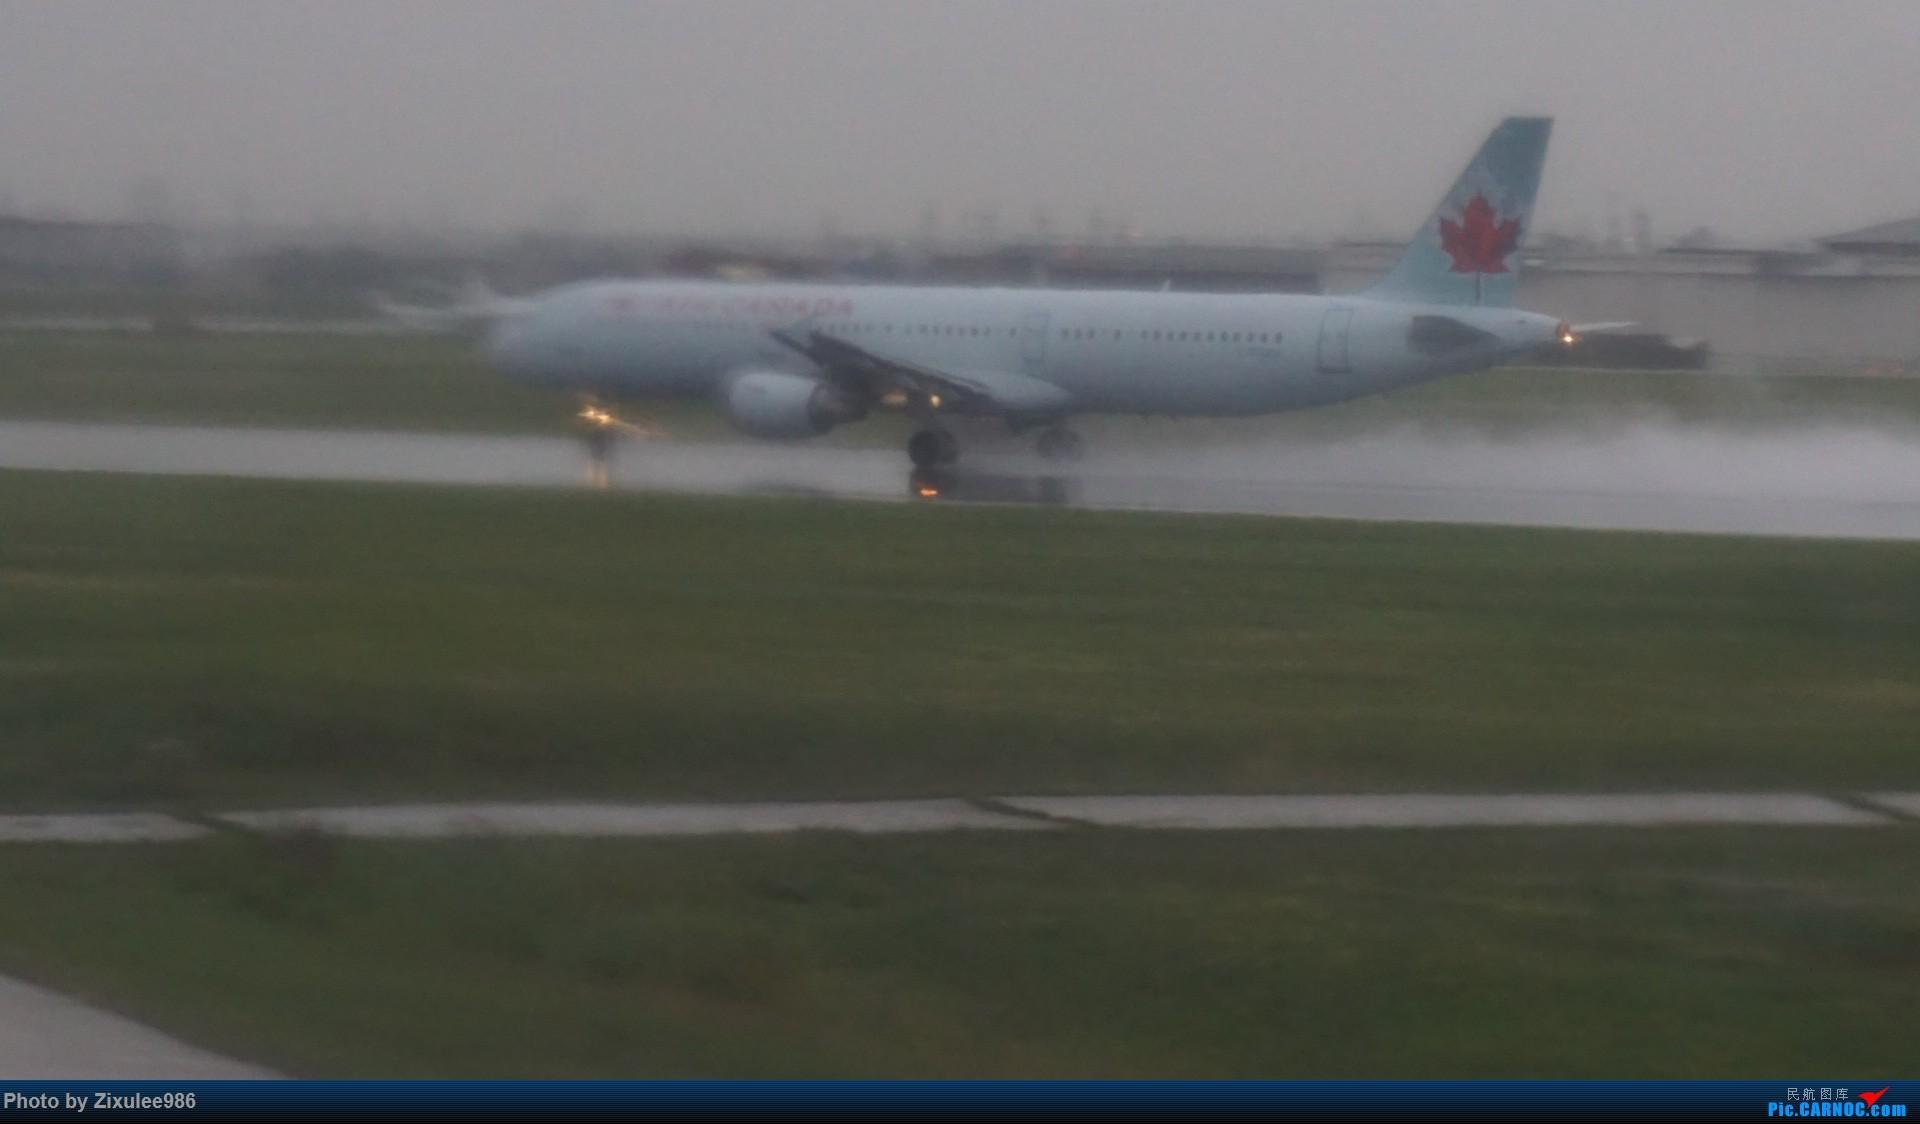 Re:[原创]加拿大21日游学之旅 (二)~加航AC28..PVG-YYZ到达多村后的雨天~多图缓更(将会附上上一集忘发的flightlog)请各位大侠谅解~ AIRBUS A321-200  加拿大多伦多皮尔逊国际机场